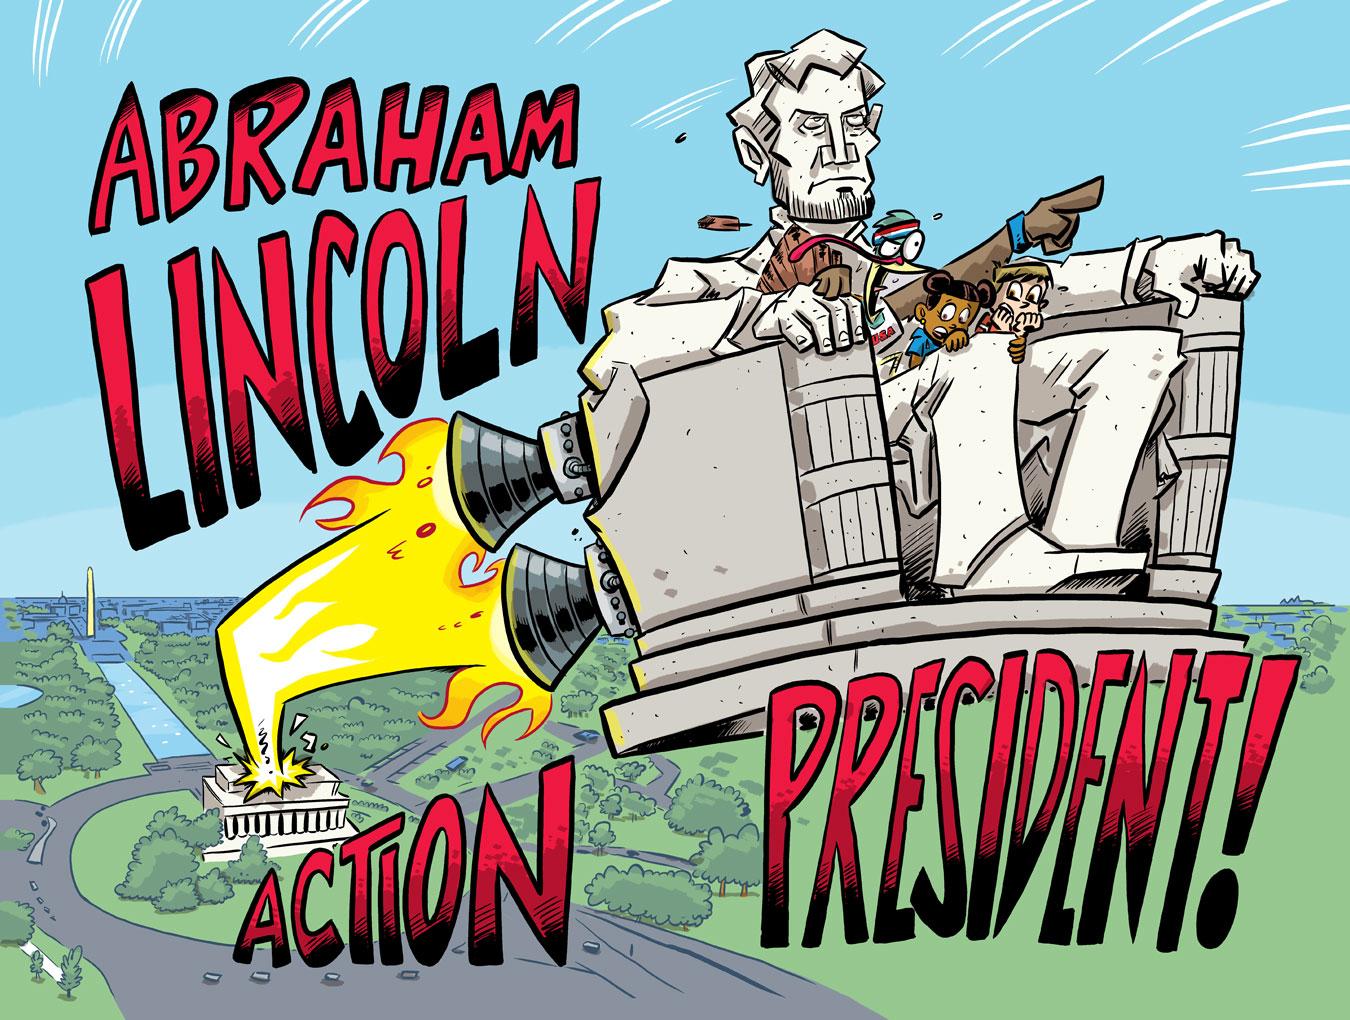 Action President: Abraham Lincoln